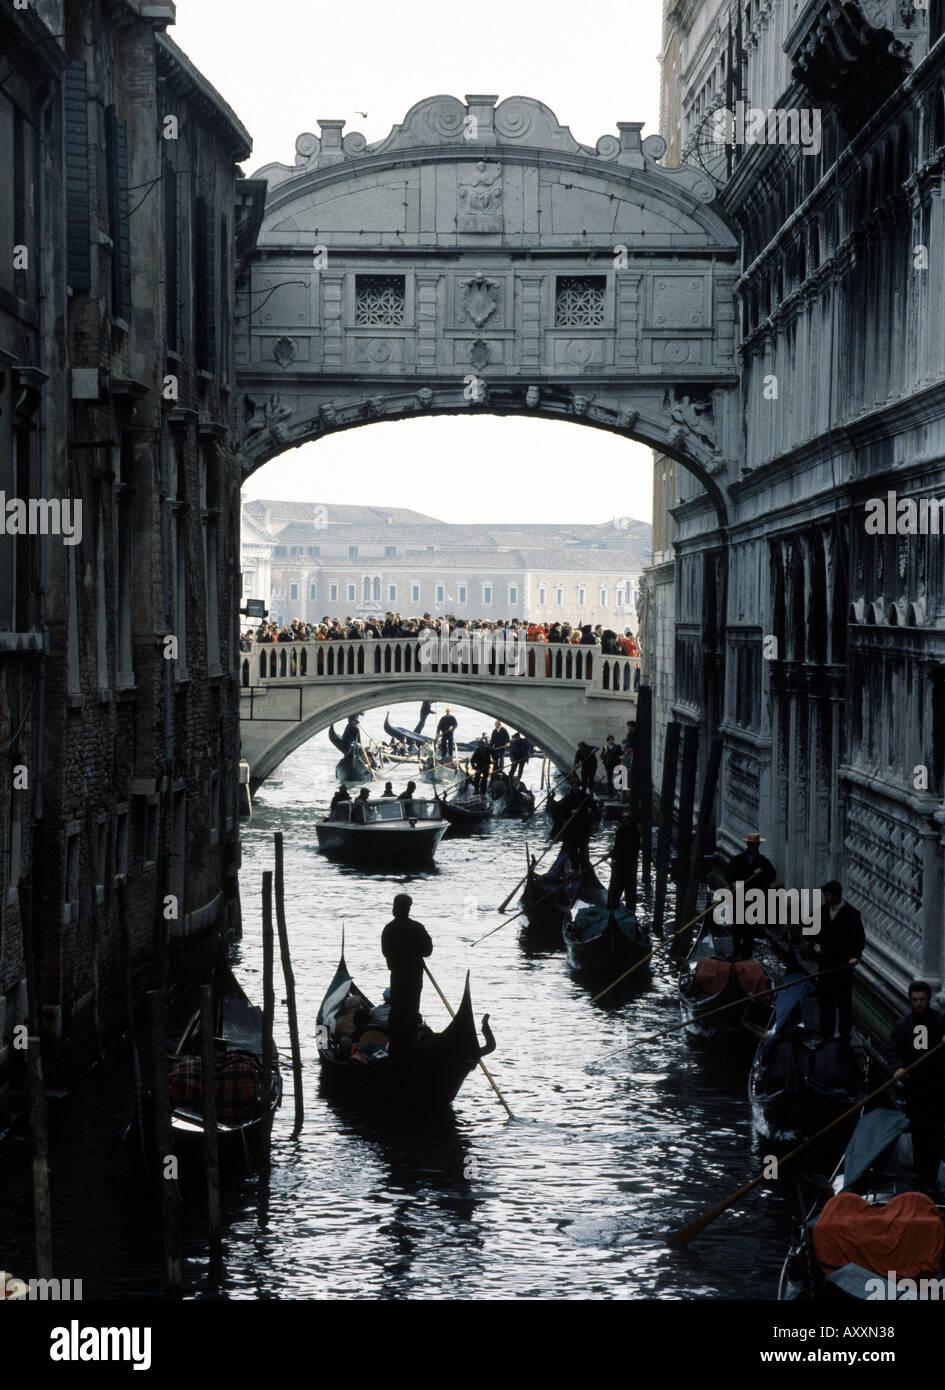 Venedig, Seufzerbrücke, Gondeln - Stock Image